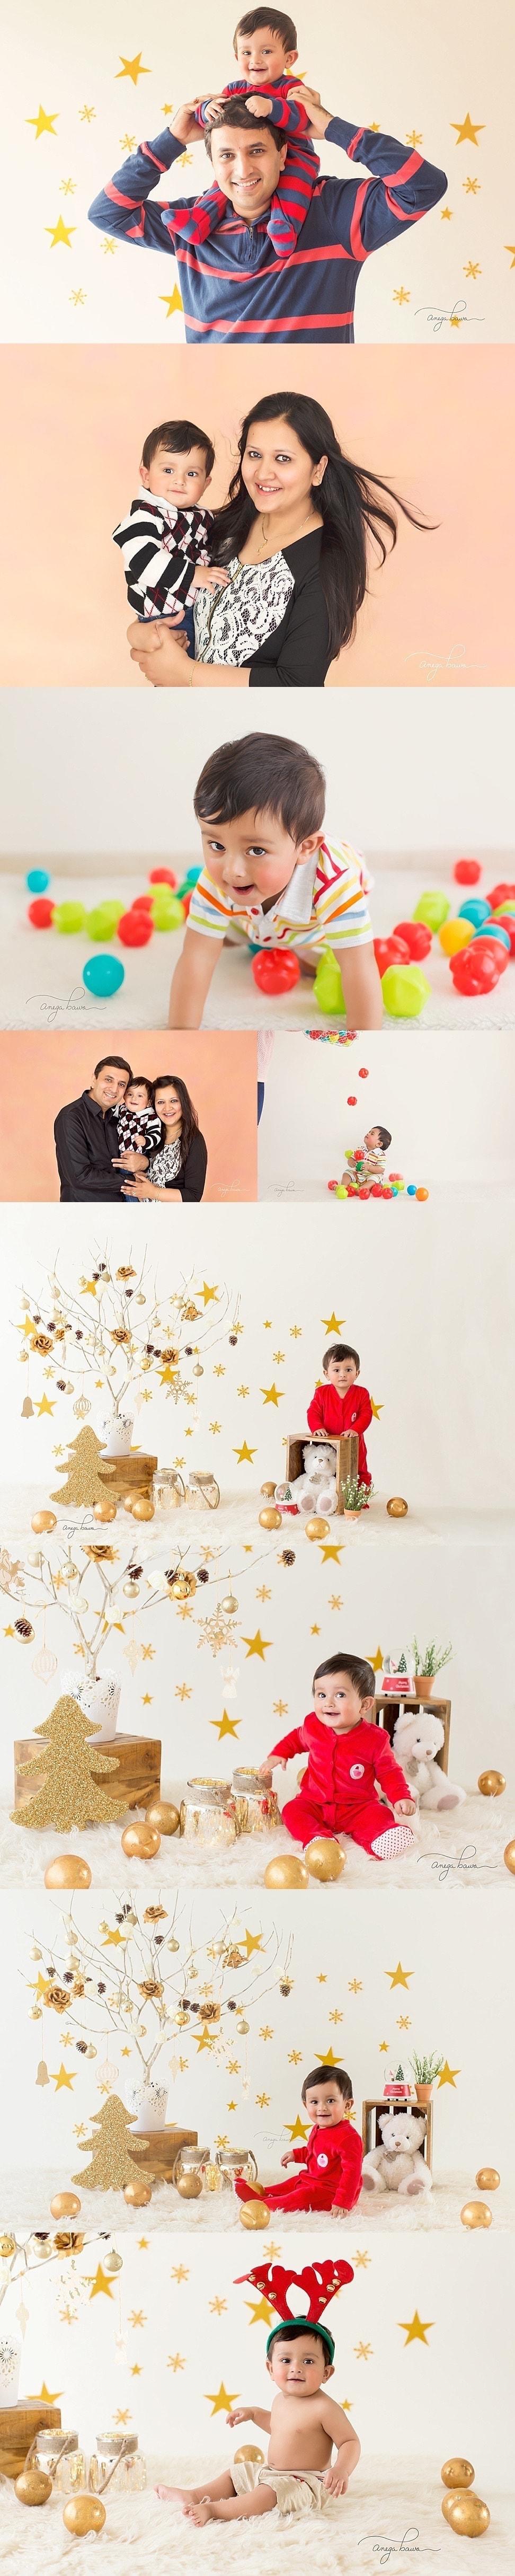 sitter_session_8-months-boy_baby_child